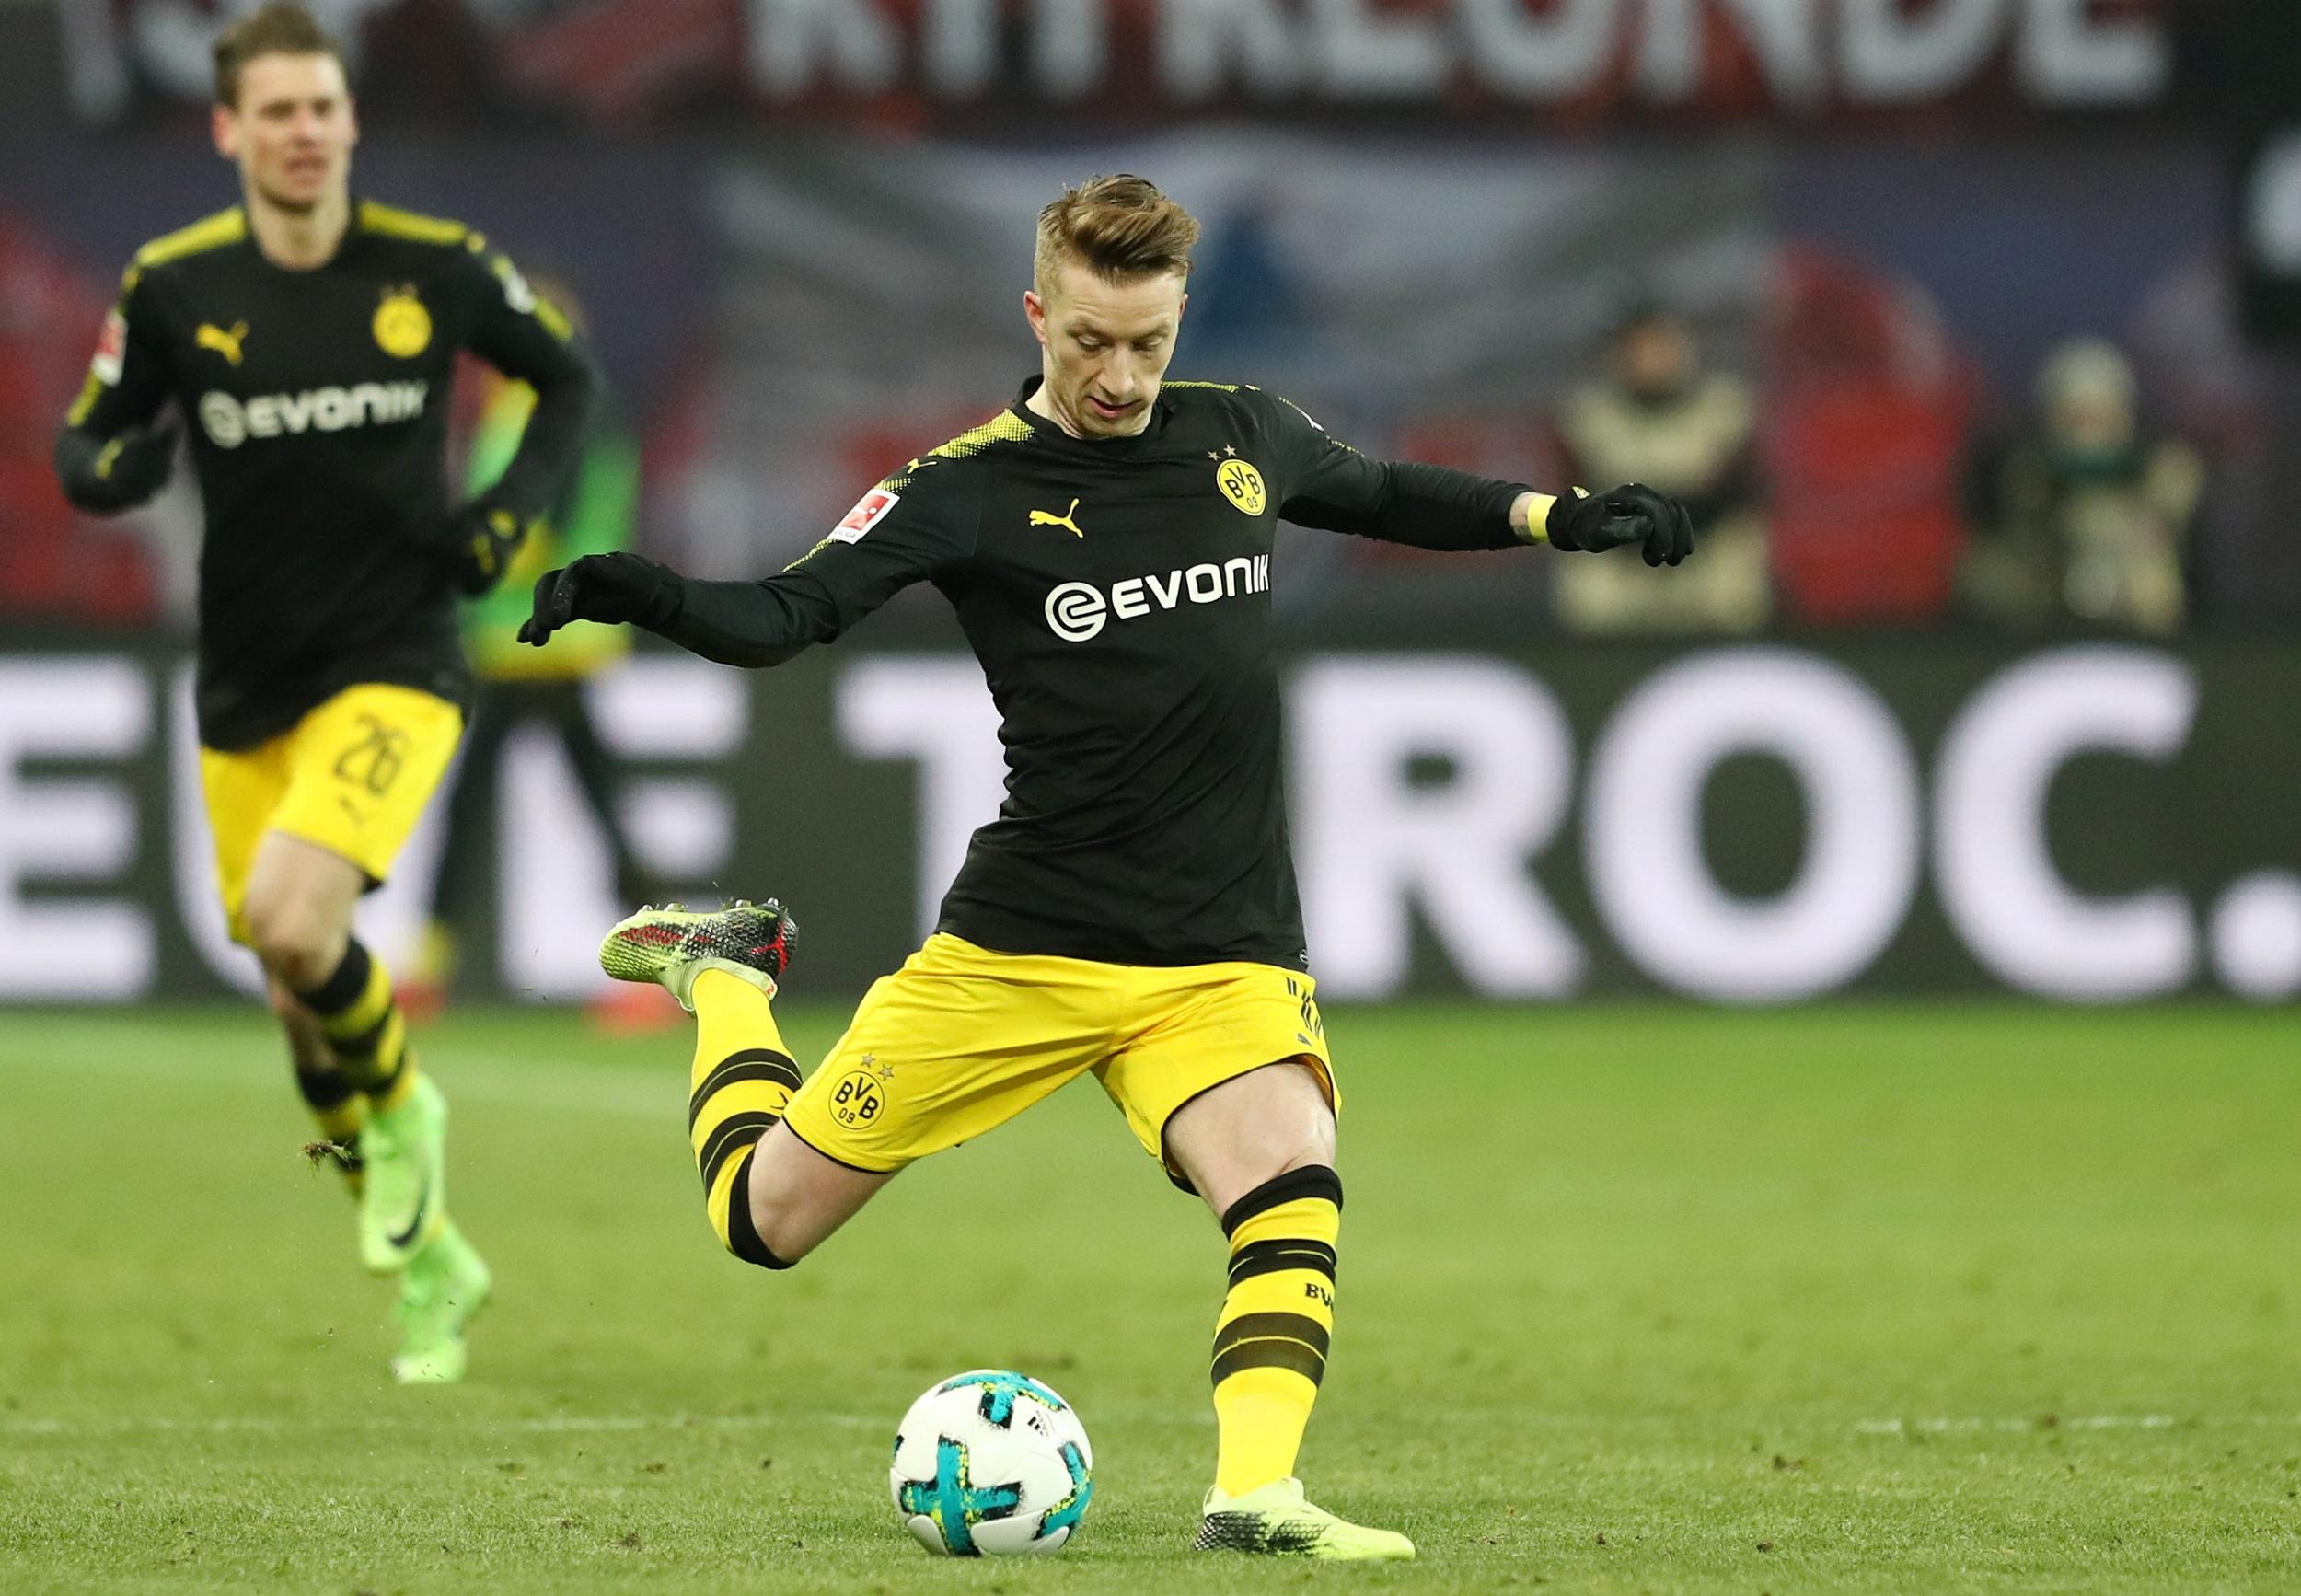 Dortmund golea a Holstein Kiel para llegar a la final de la DFB-Pokal